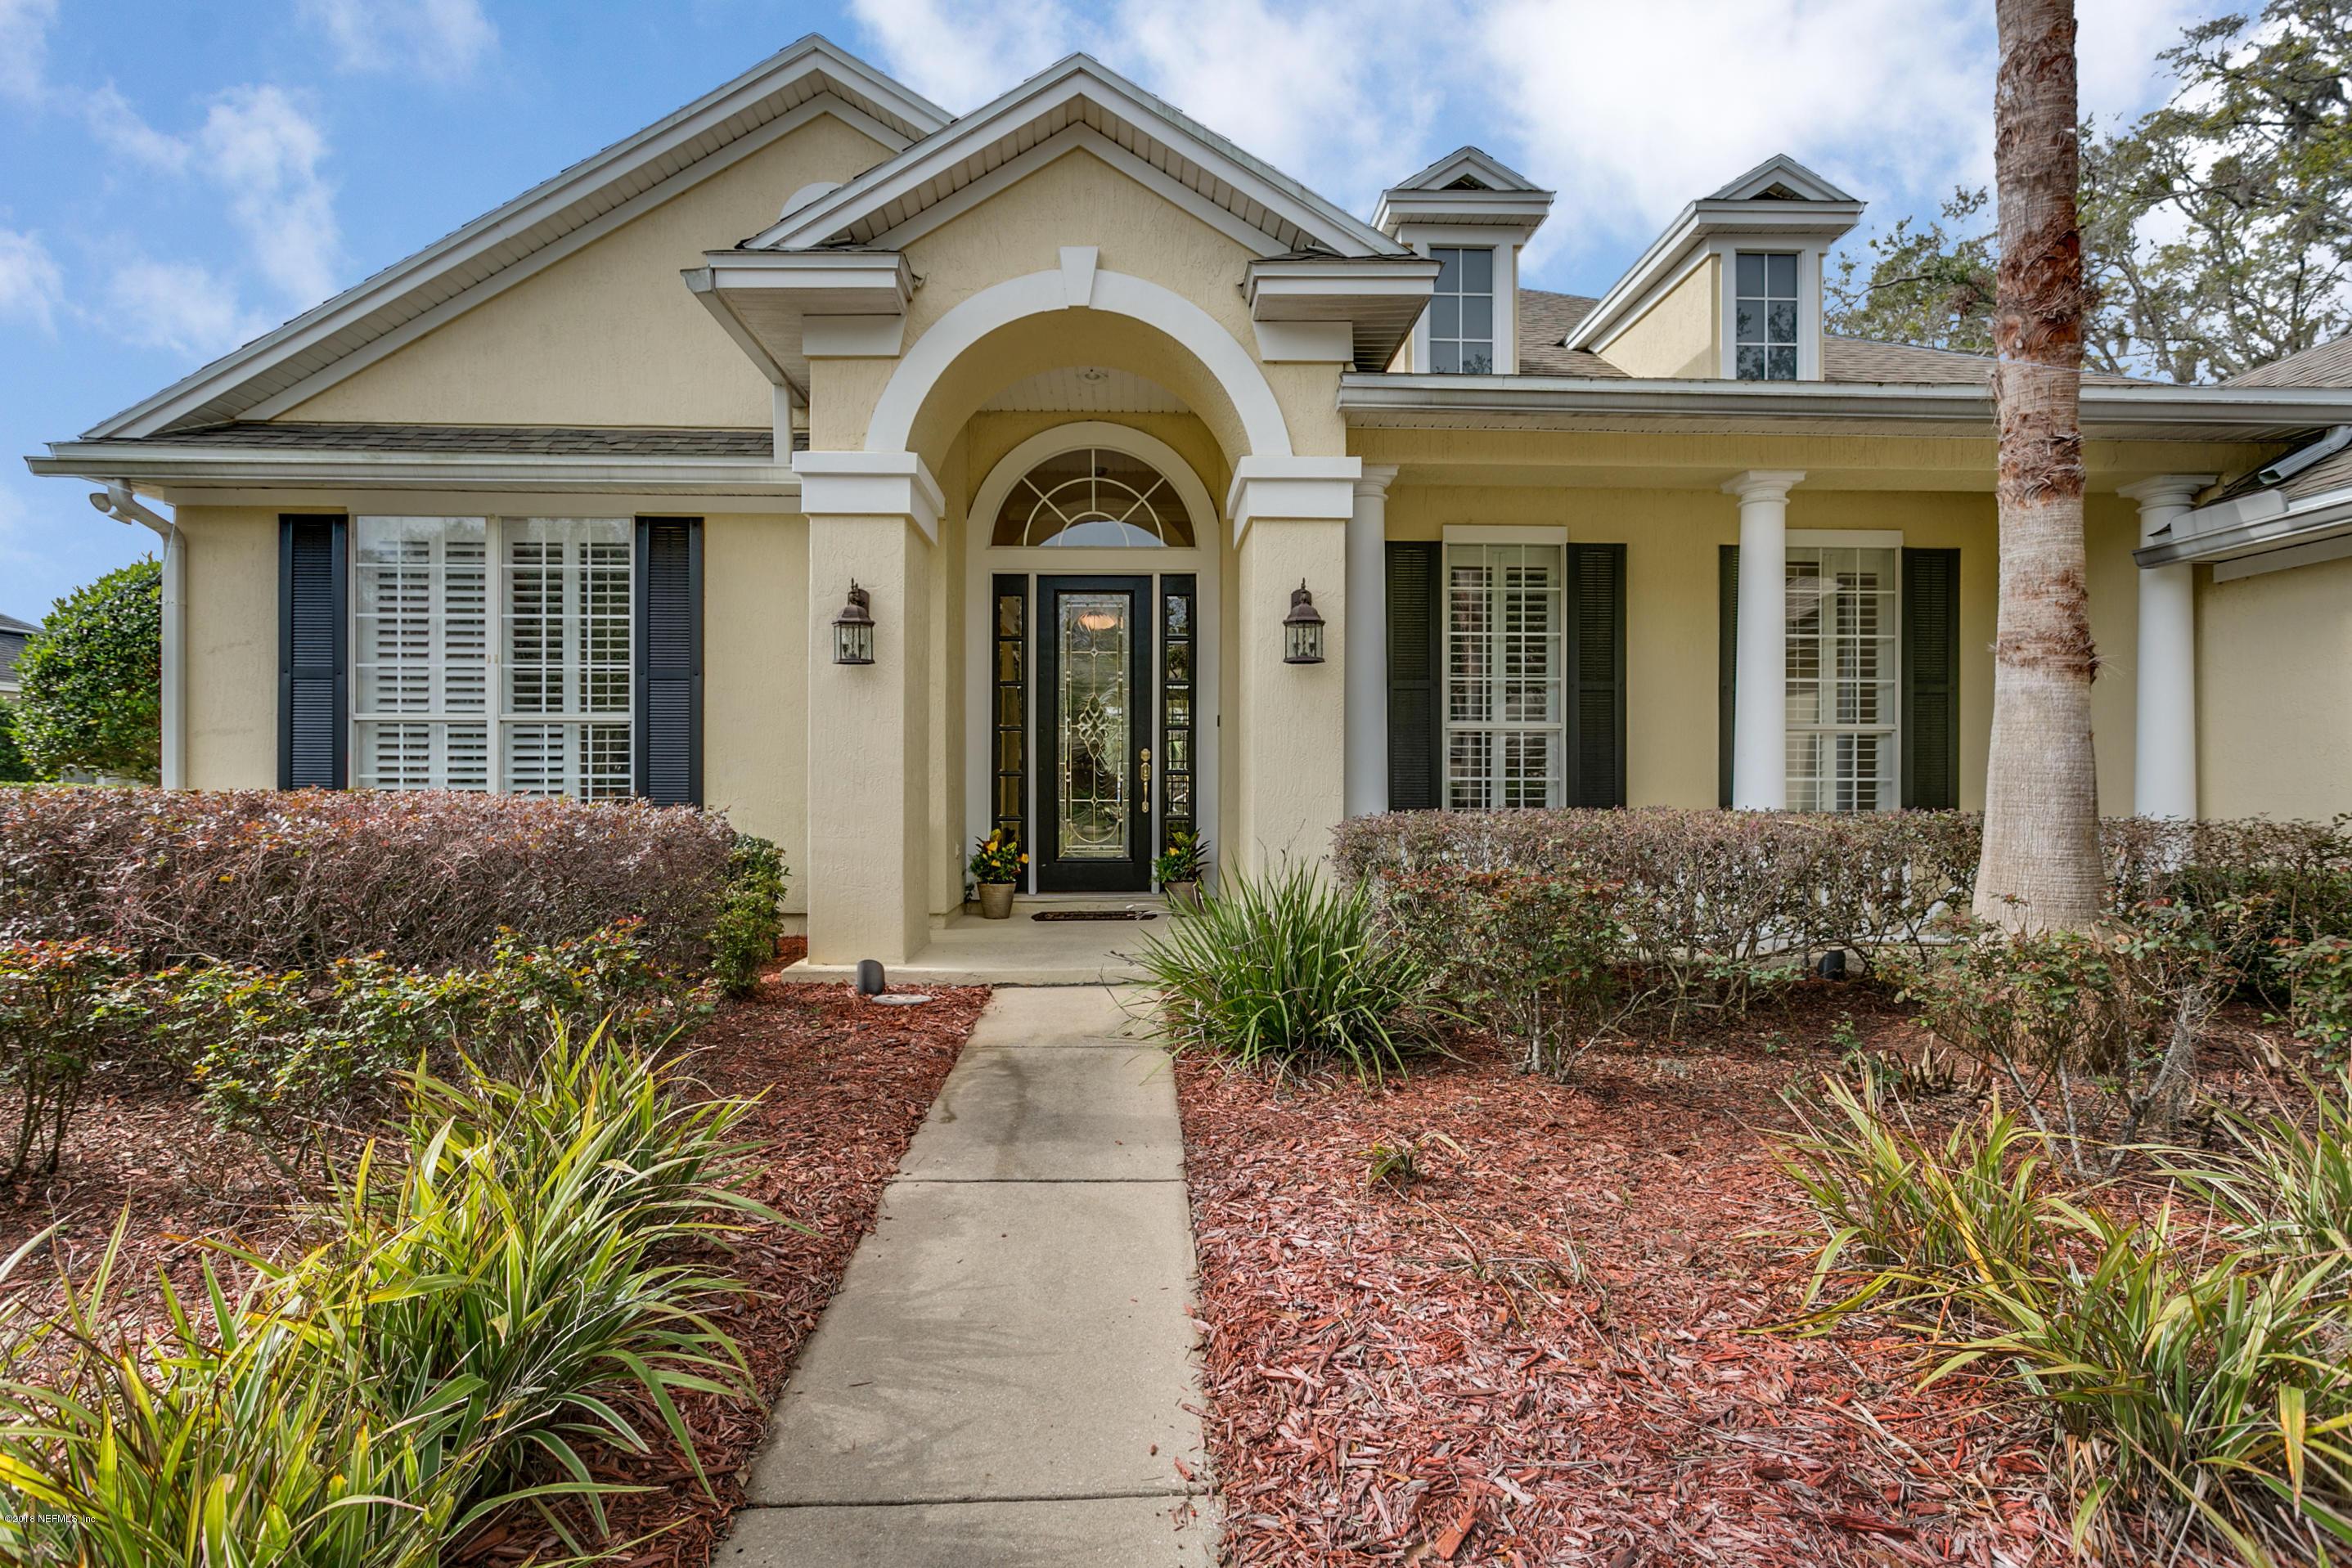 13766 SAXON LAKE, JACKSONVILLE, FLORIDA 32225, 5 Bedrooms Bedrooms, ,4 BathroomsBathrooms,Residential - single family,For sale,SAXON LAKE,964986